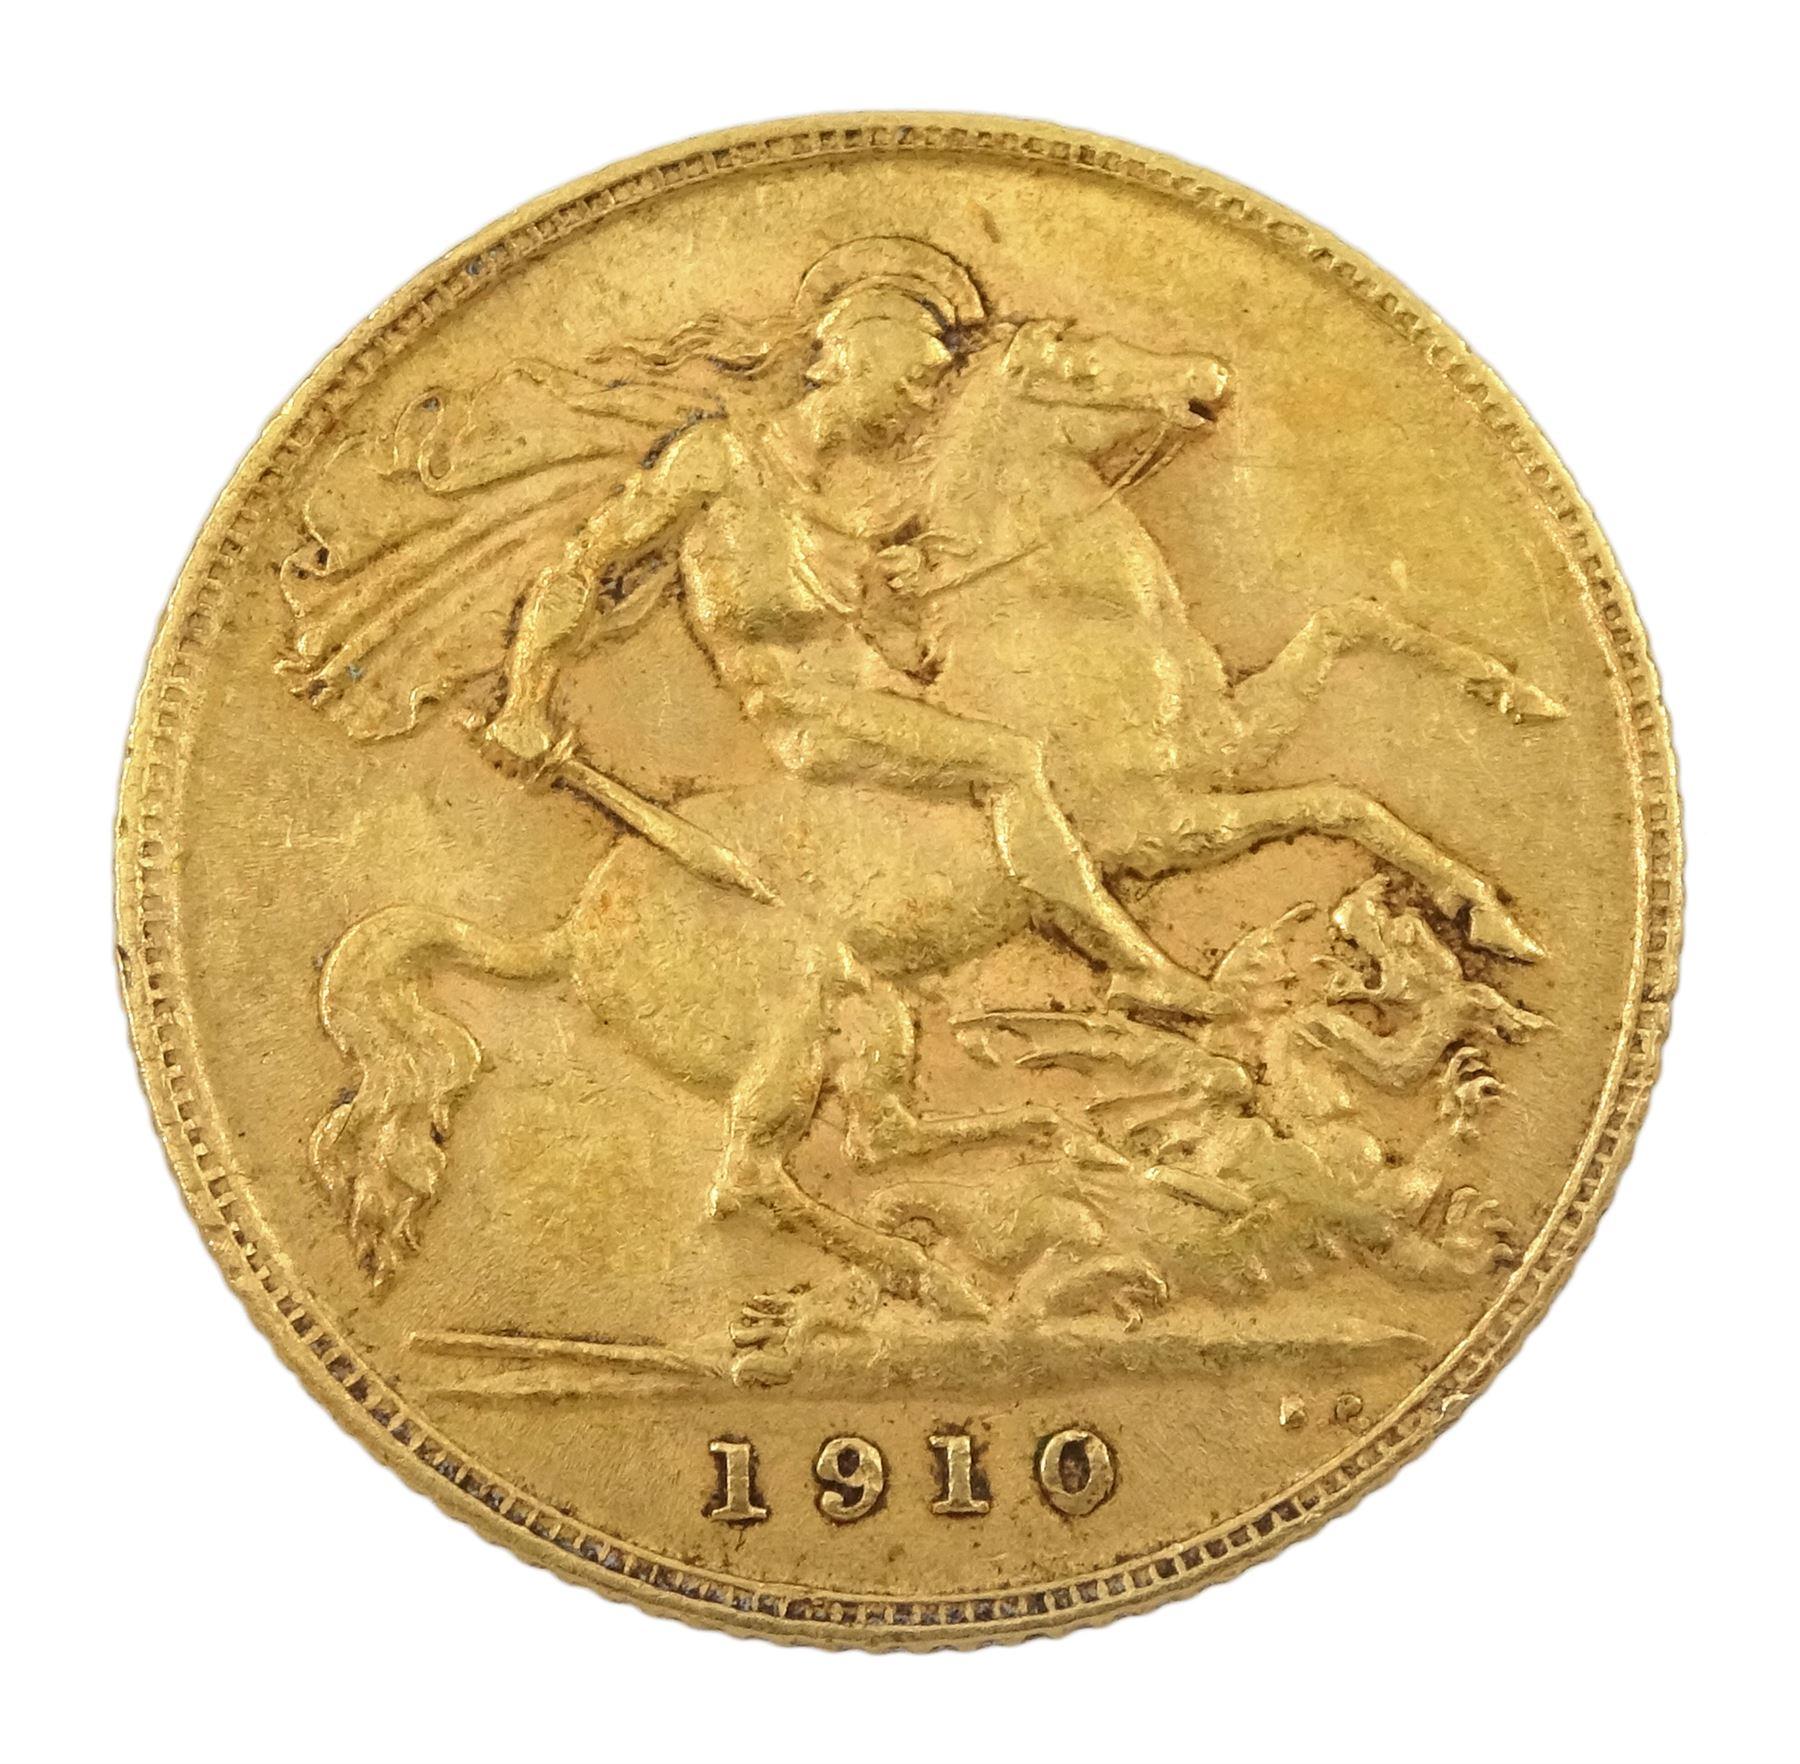 King Edward VII 1910 gold half sovereign coin - Image 2 of 2